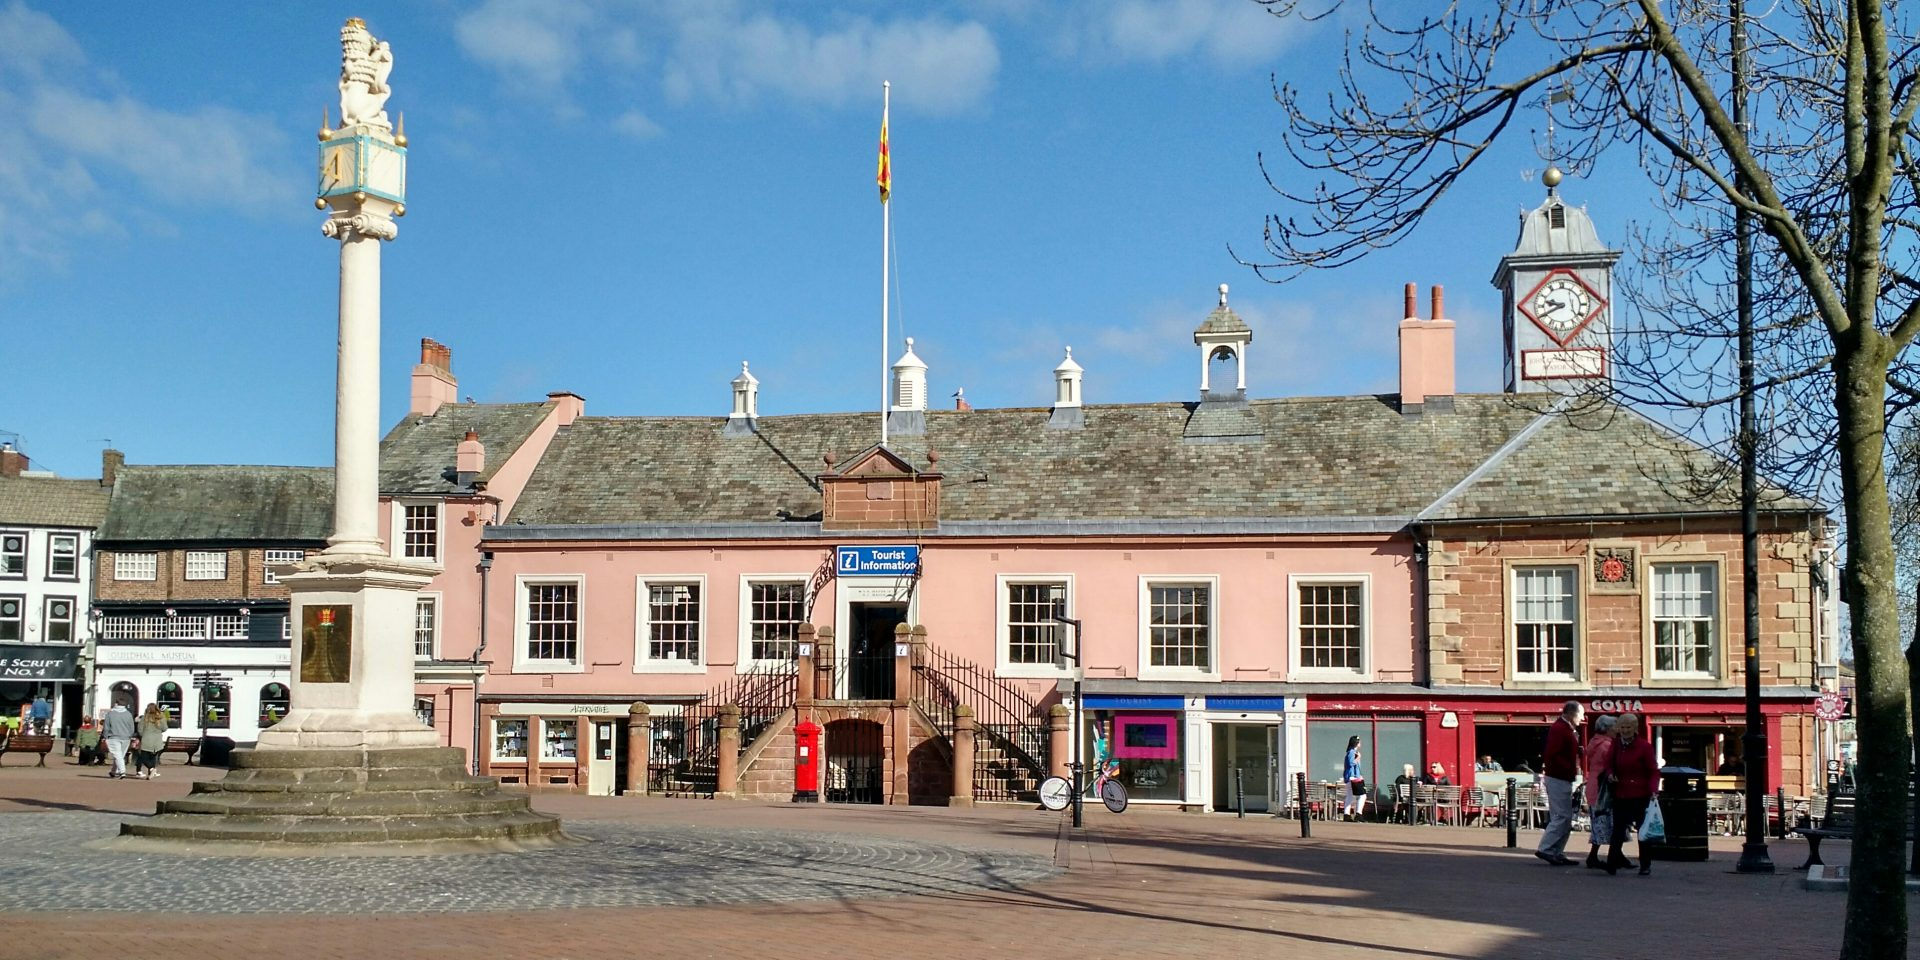 Carlisle Tourist Centre, Cumbria Way Start / Finish